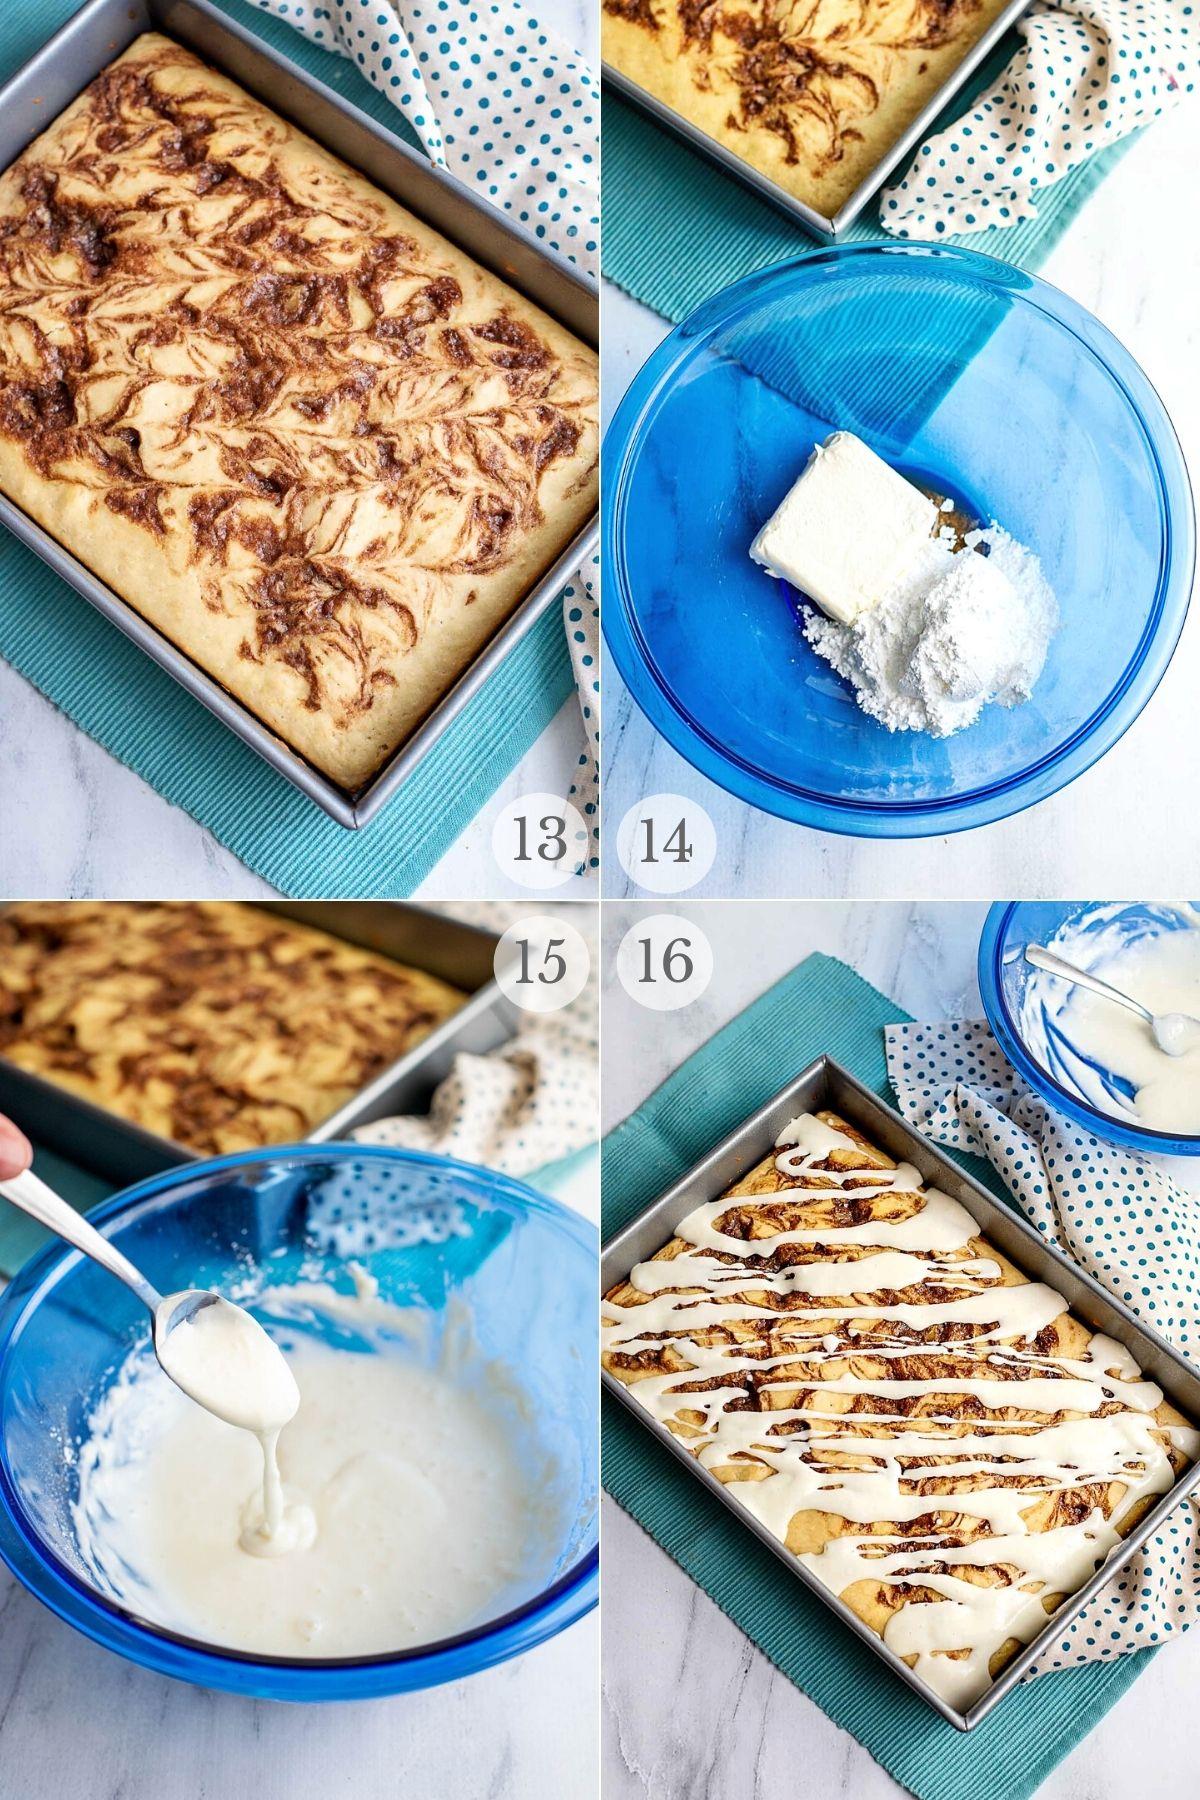 cinnamon roll cake recipe steps 13-16